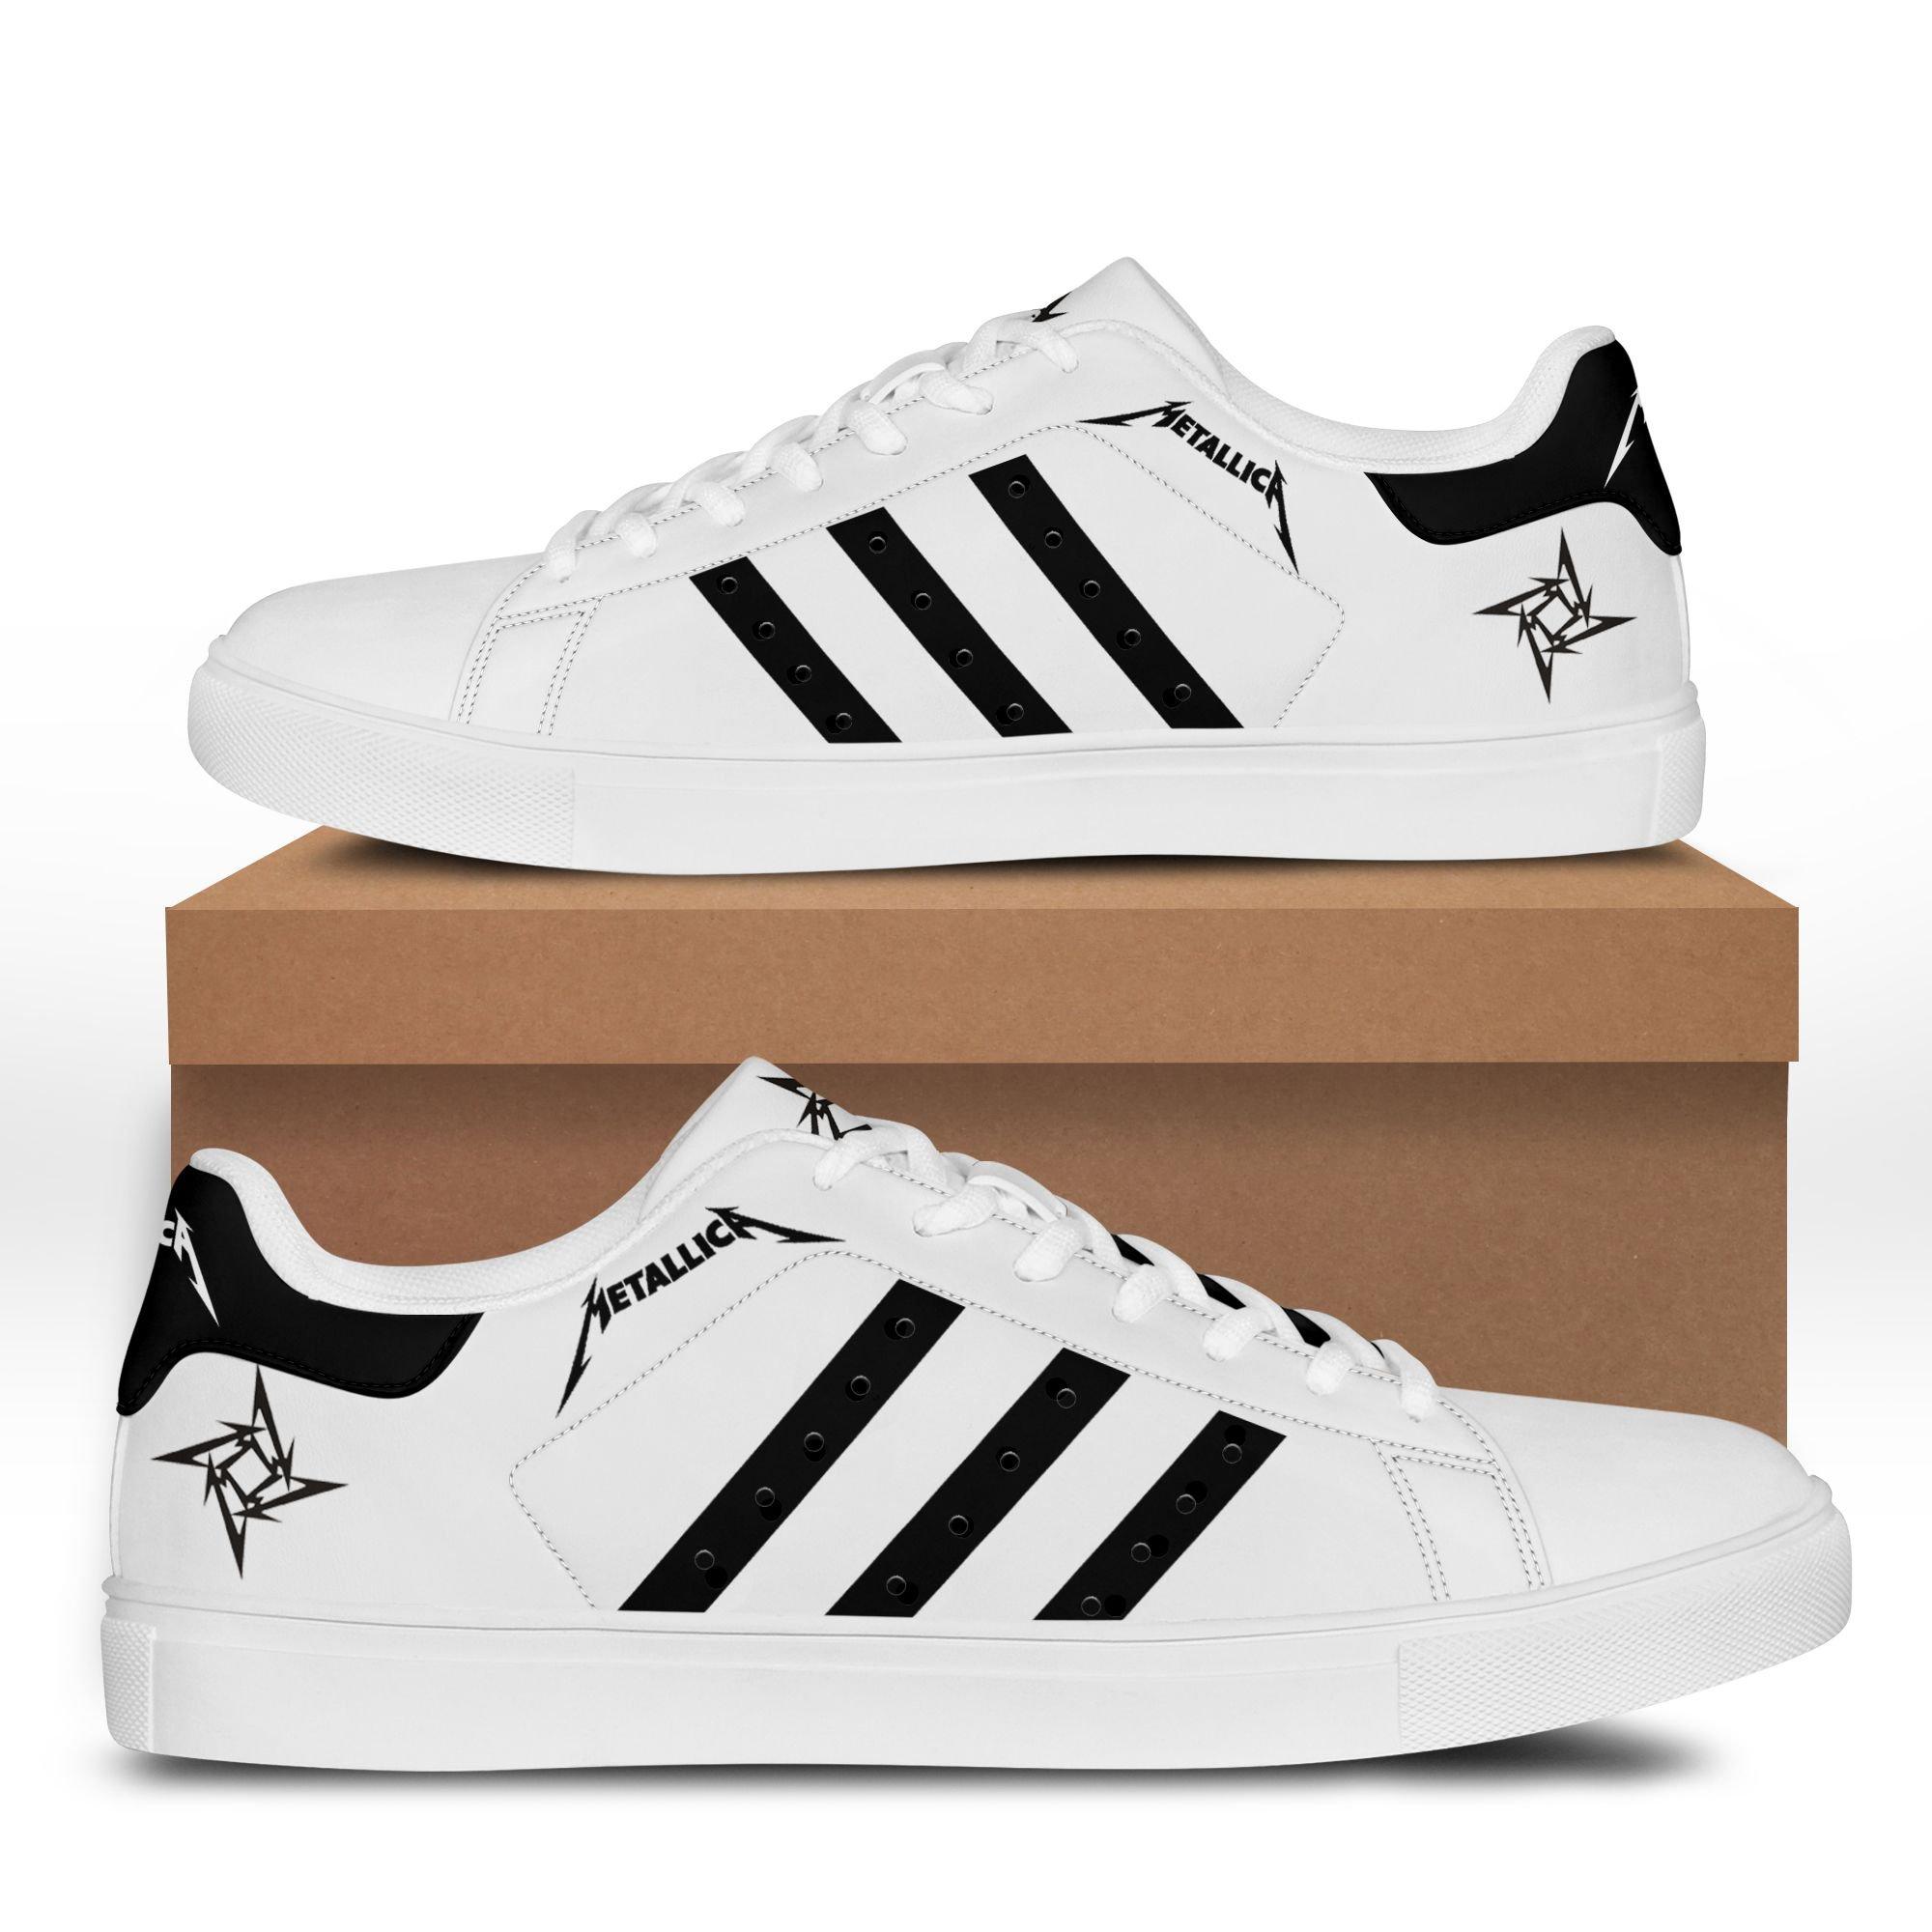 Metallica black and white Stan Smith Sneaker